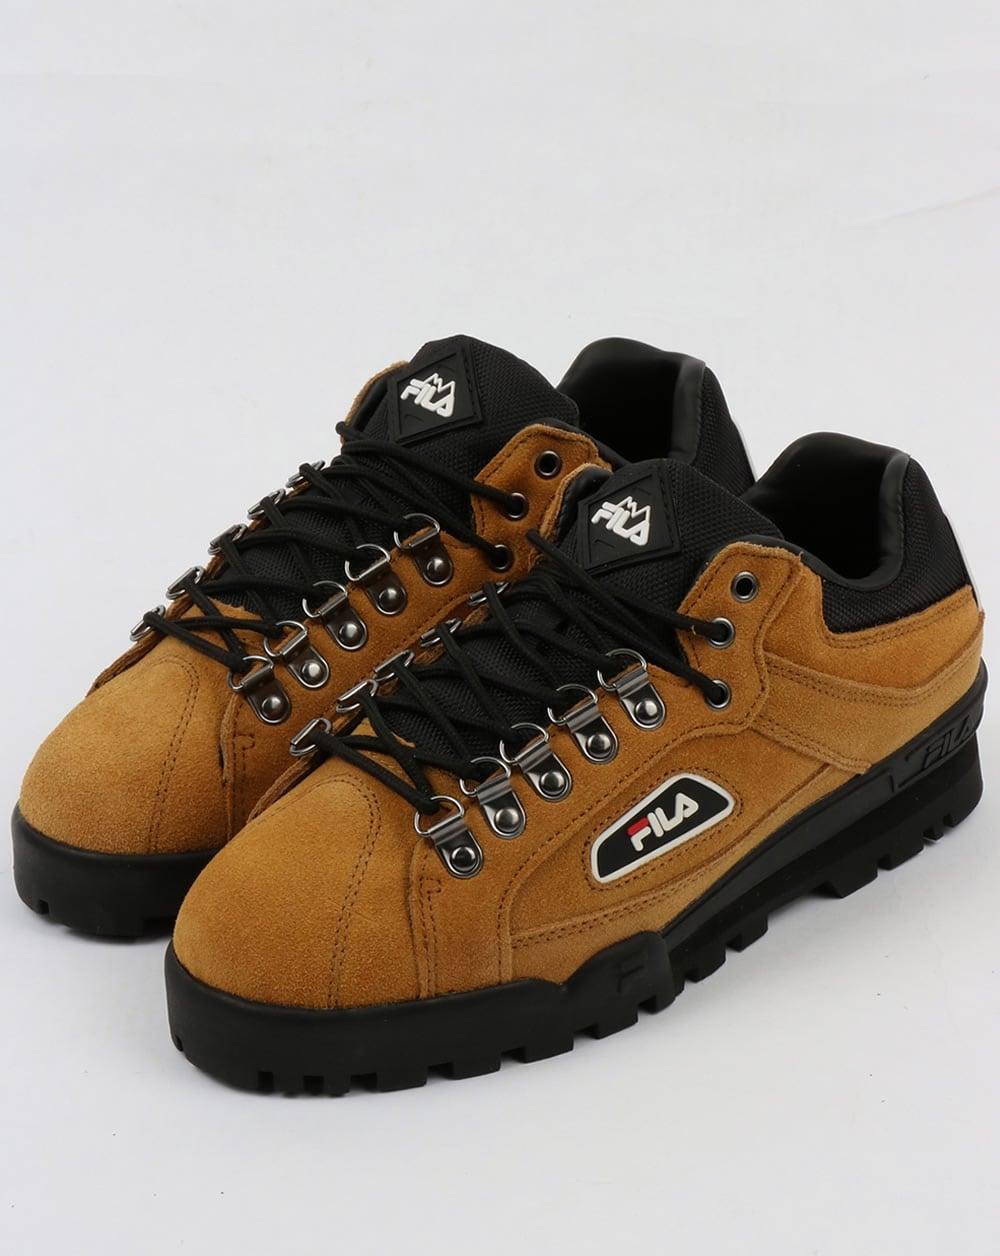 Fila Vintage Trailblazer Suede Boots